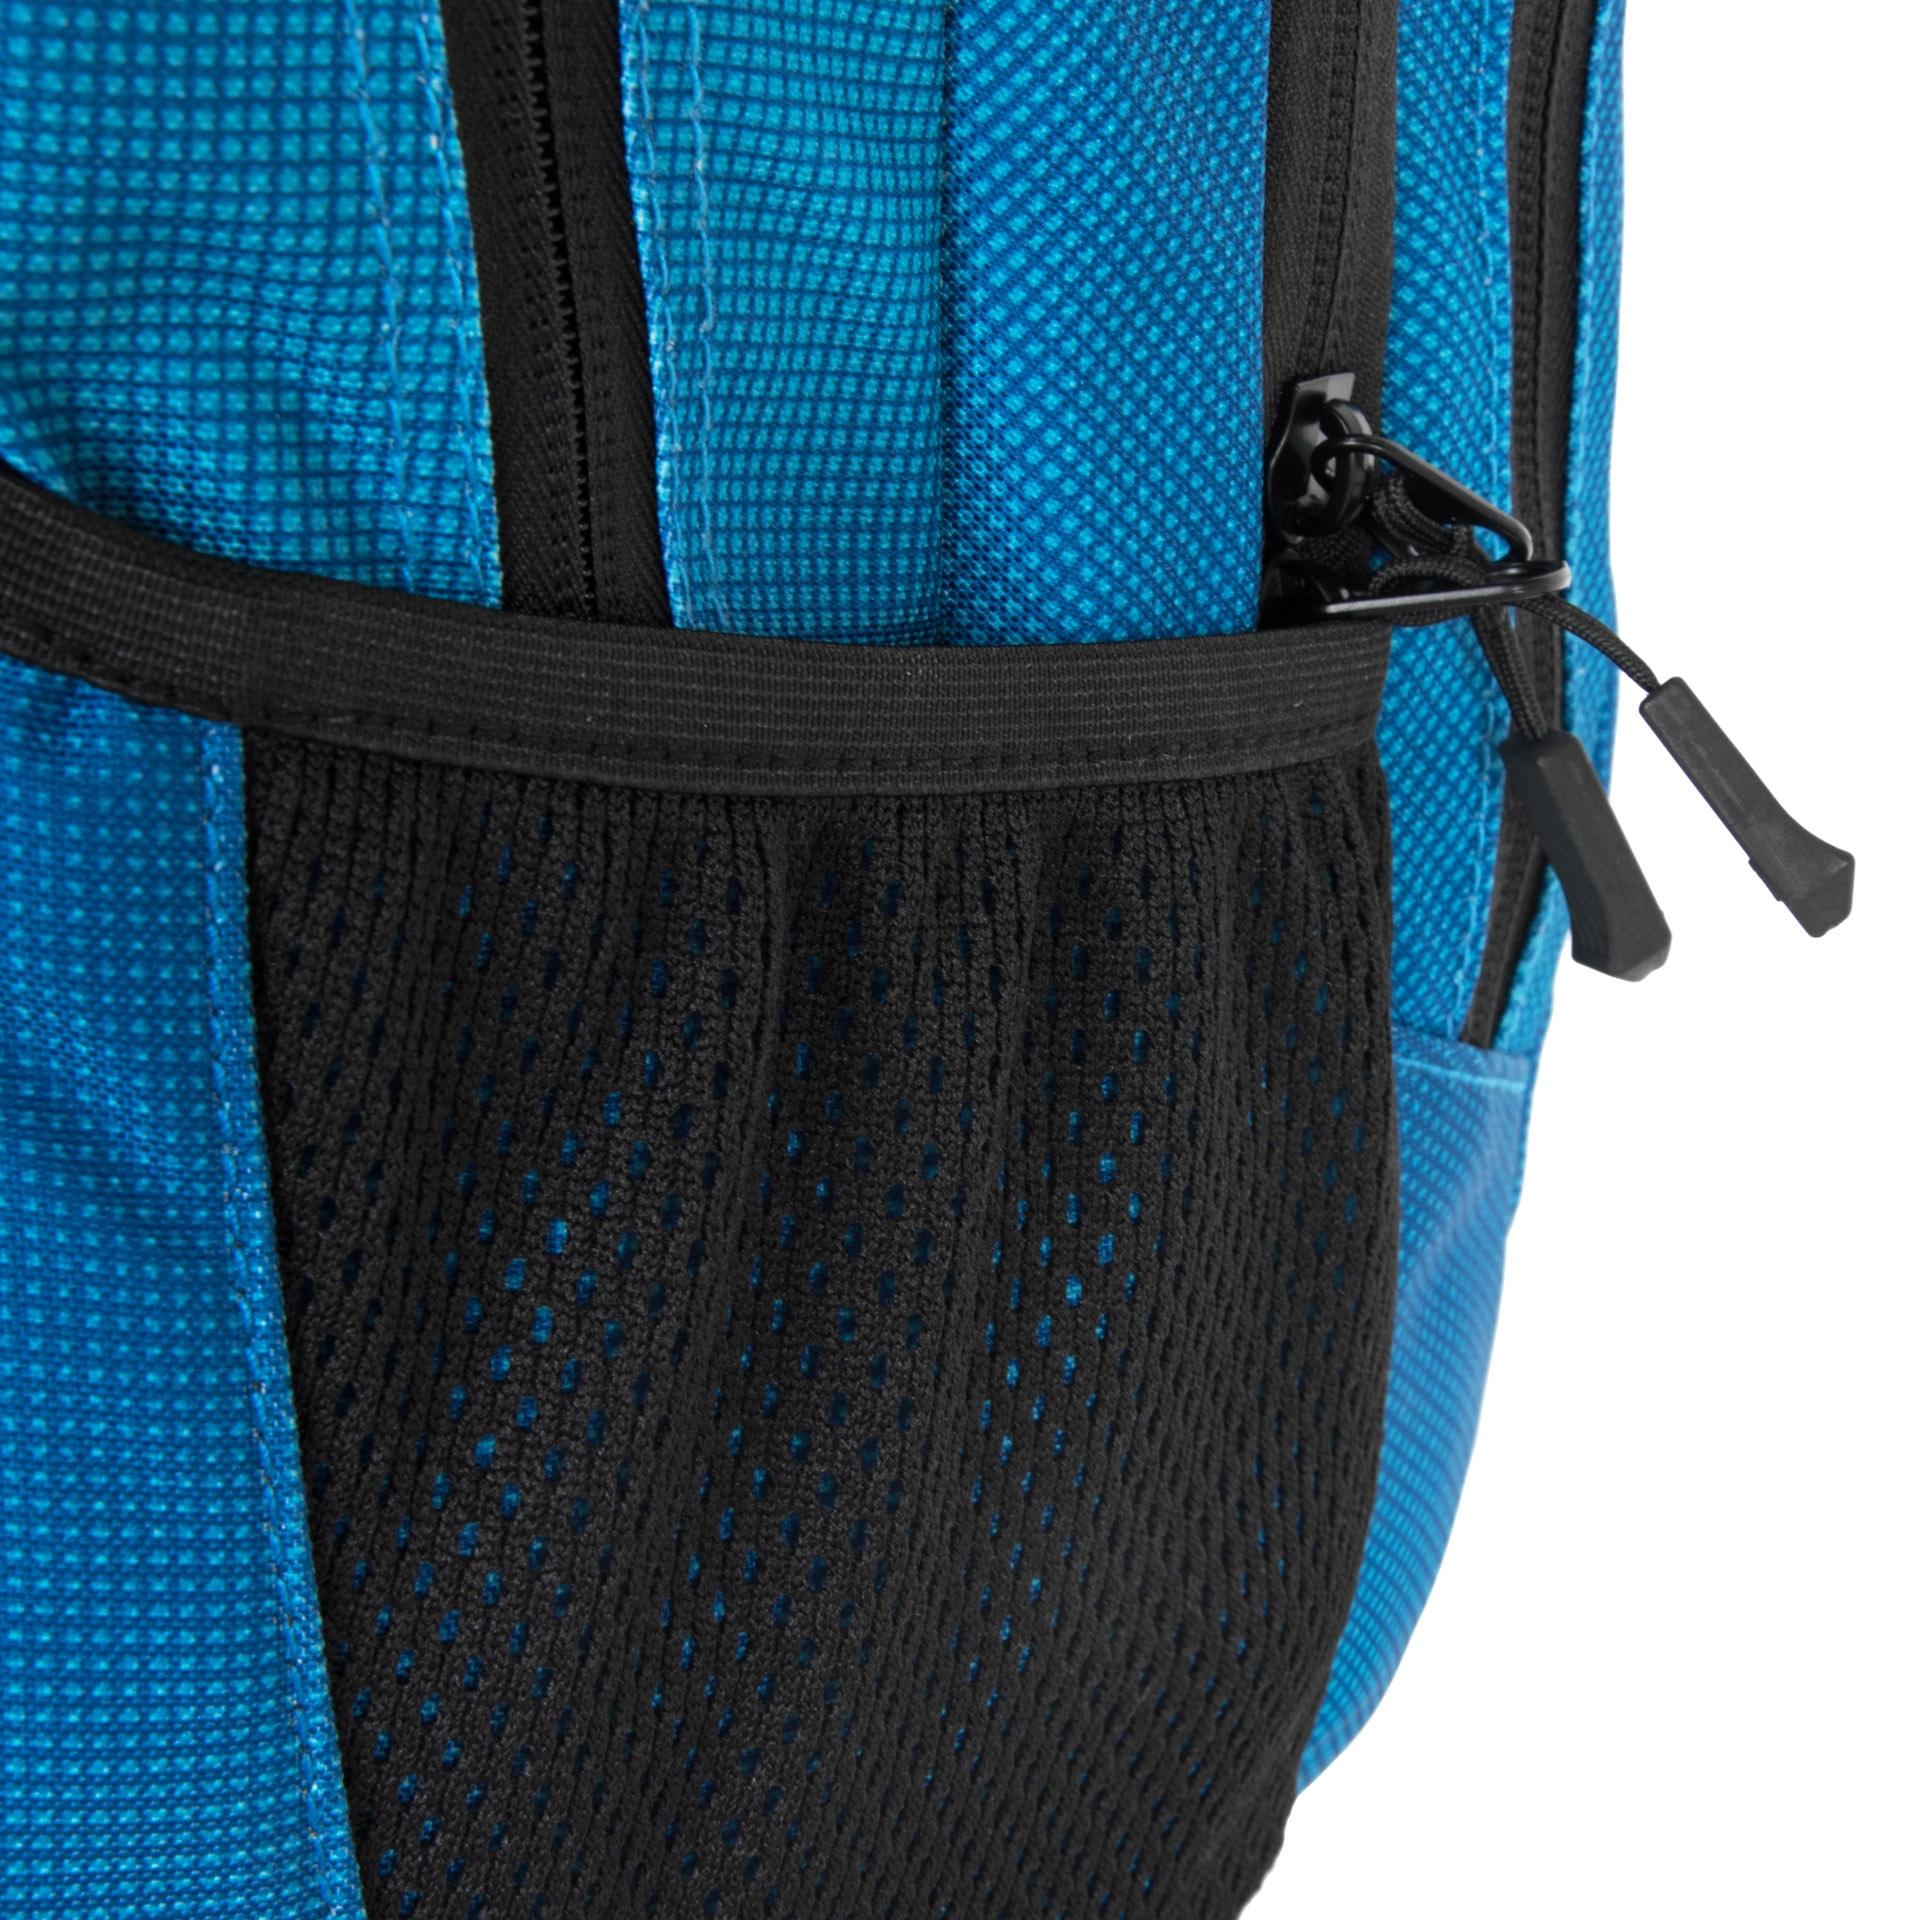 Nitro Chase Blur brilliant blue Originálny batoh Nitro Chase vás nesklame na ceste do školy, do práce ani na výlete za dobrodružstvom.